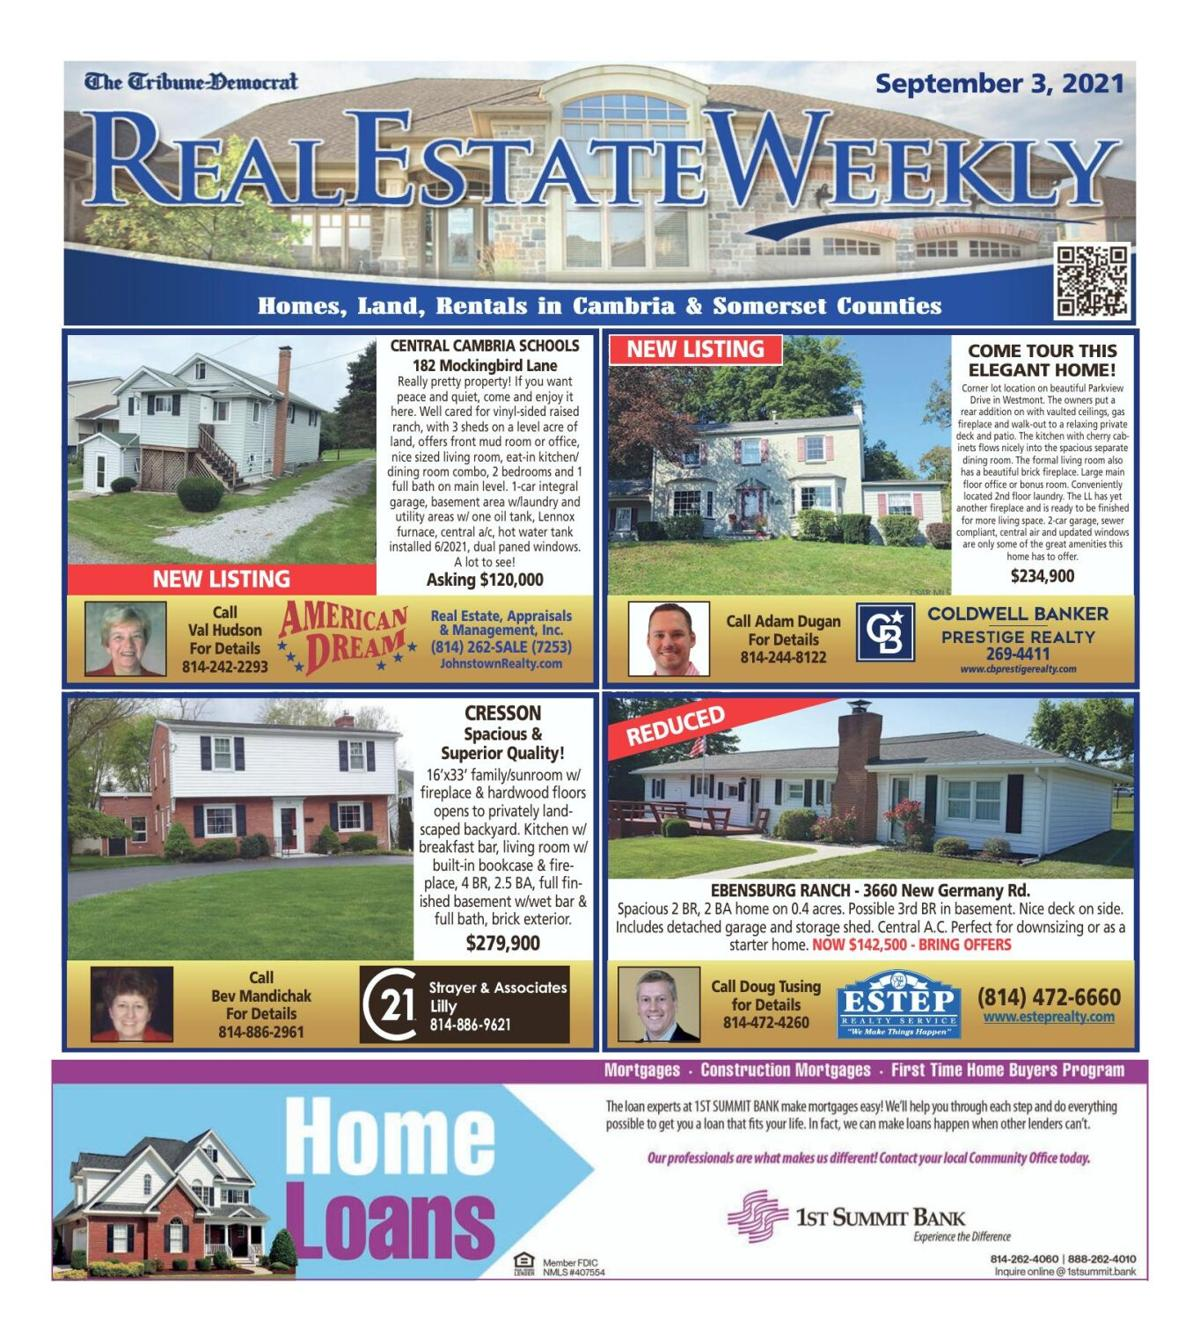 Real Estate Weekly September 3rd, 2021